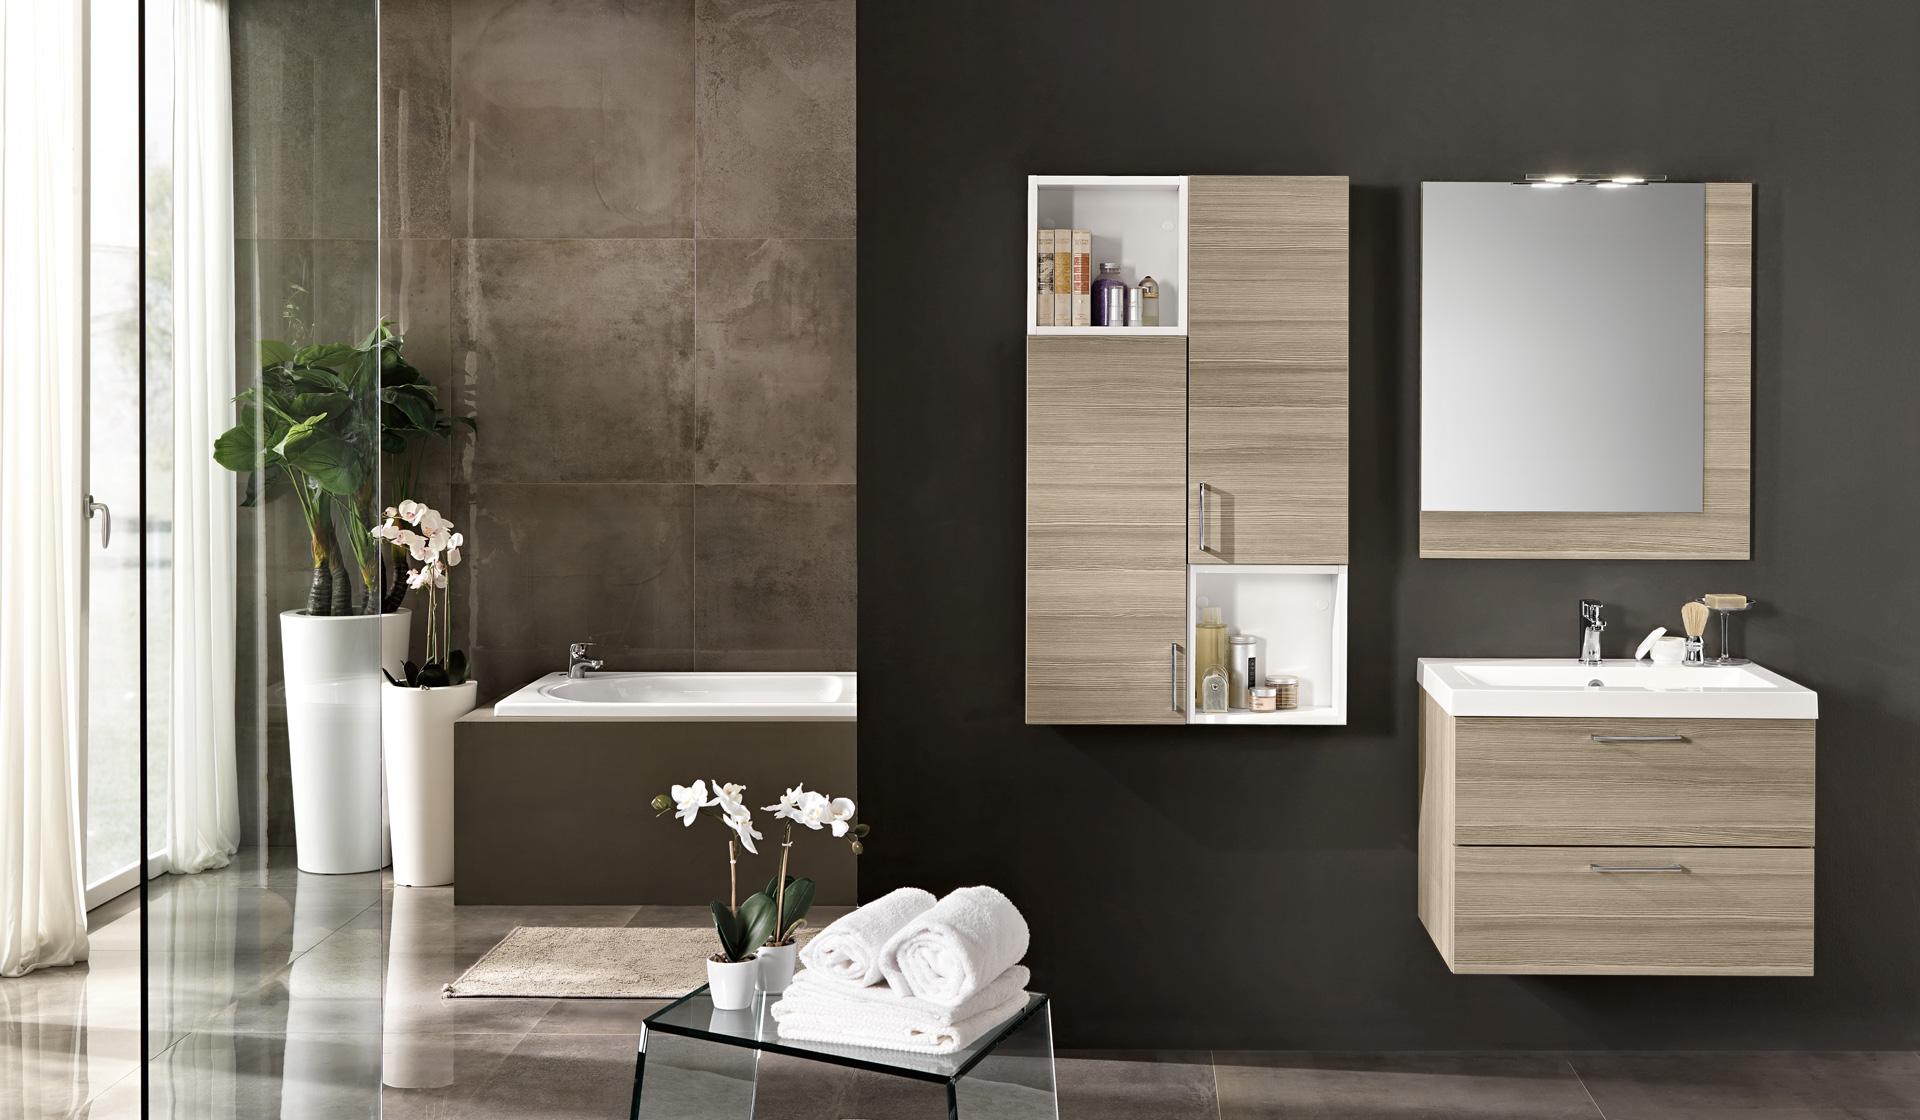 Righi arredamenti srl arredamenti per ambienti bagno for Arredamenti da bagno